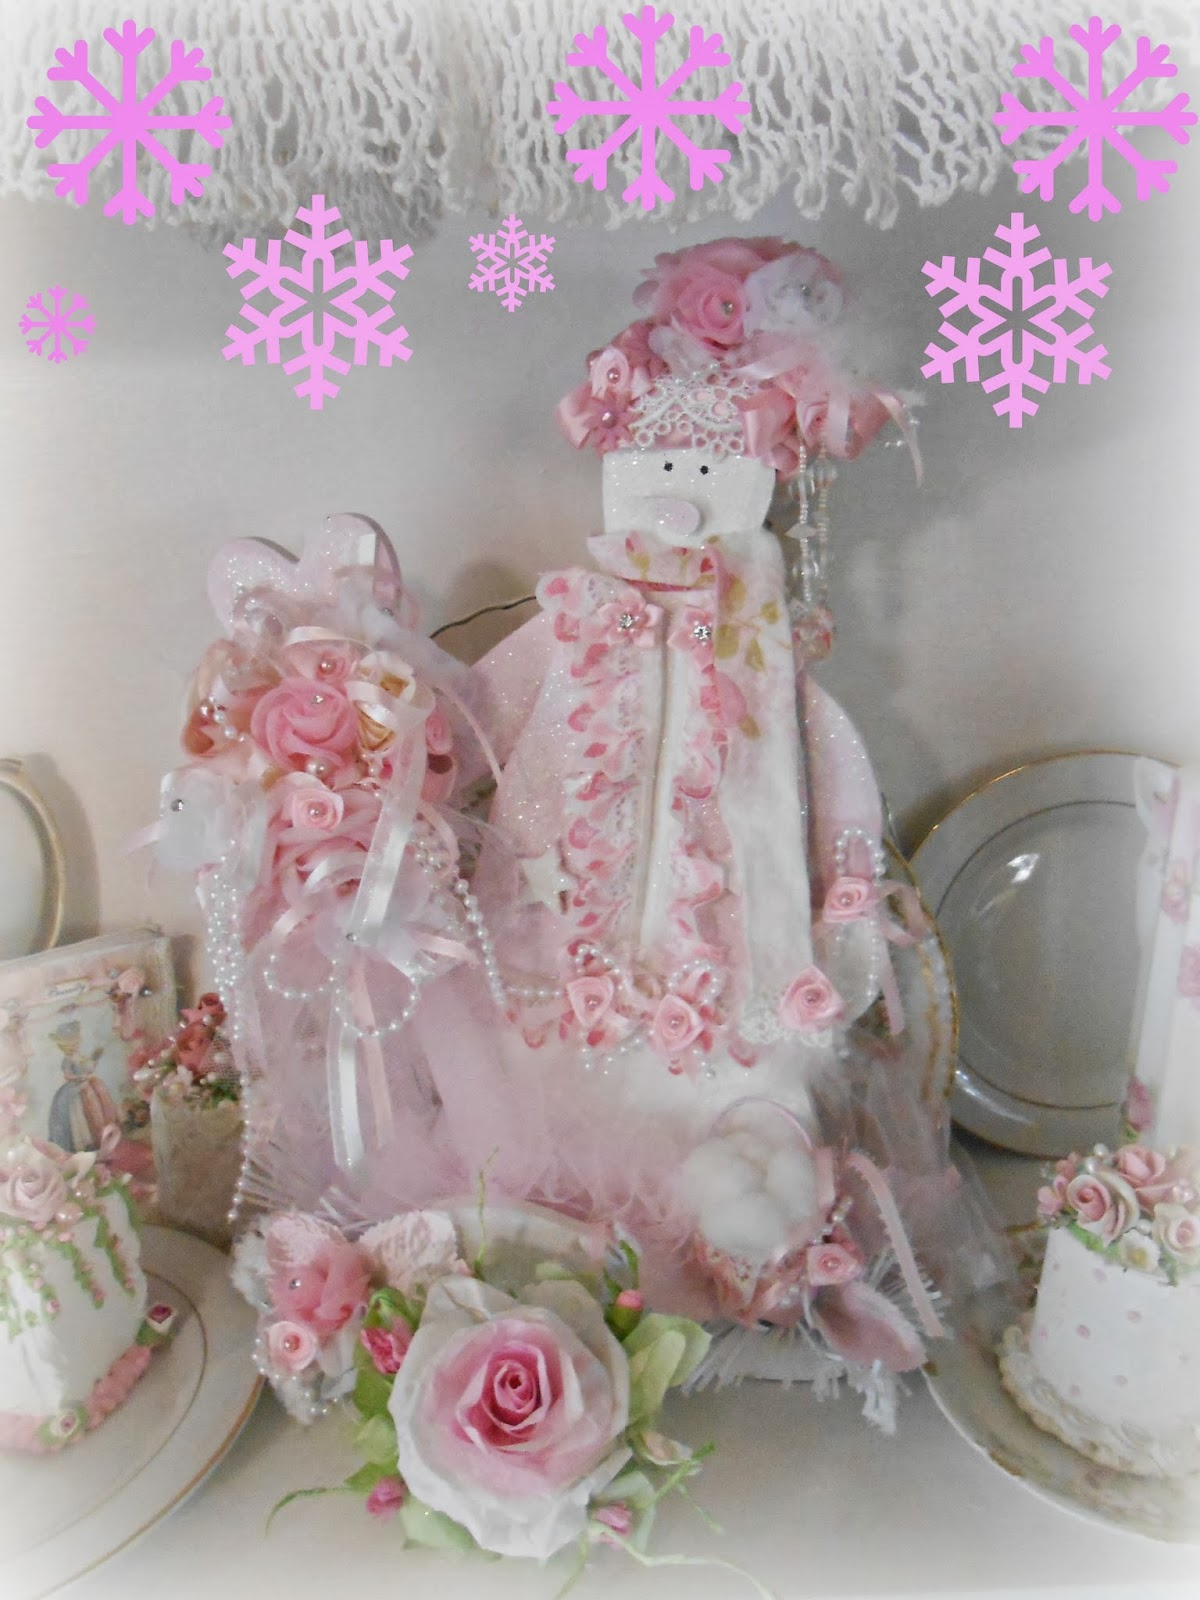 Pink Shabby Chic Dresser: Olivia's Romantic Home: Shabby Chic Pink Christmas